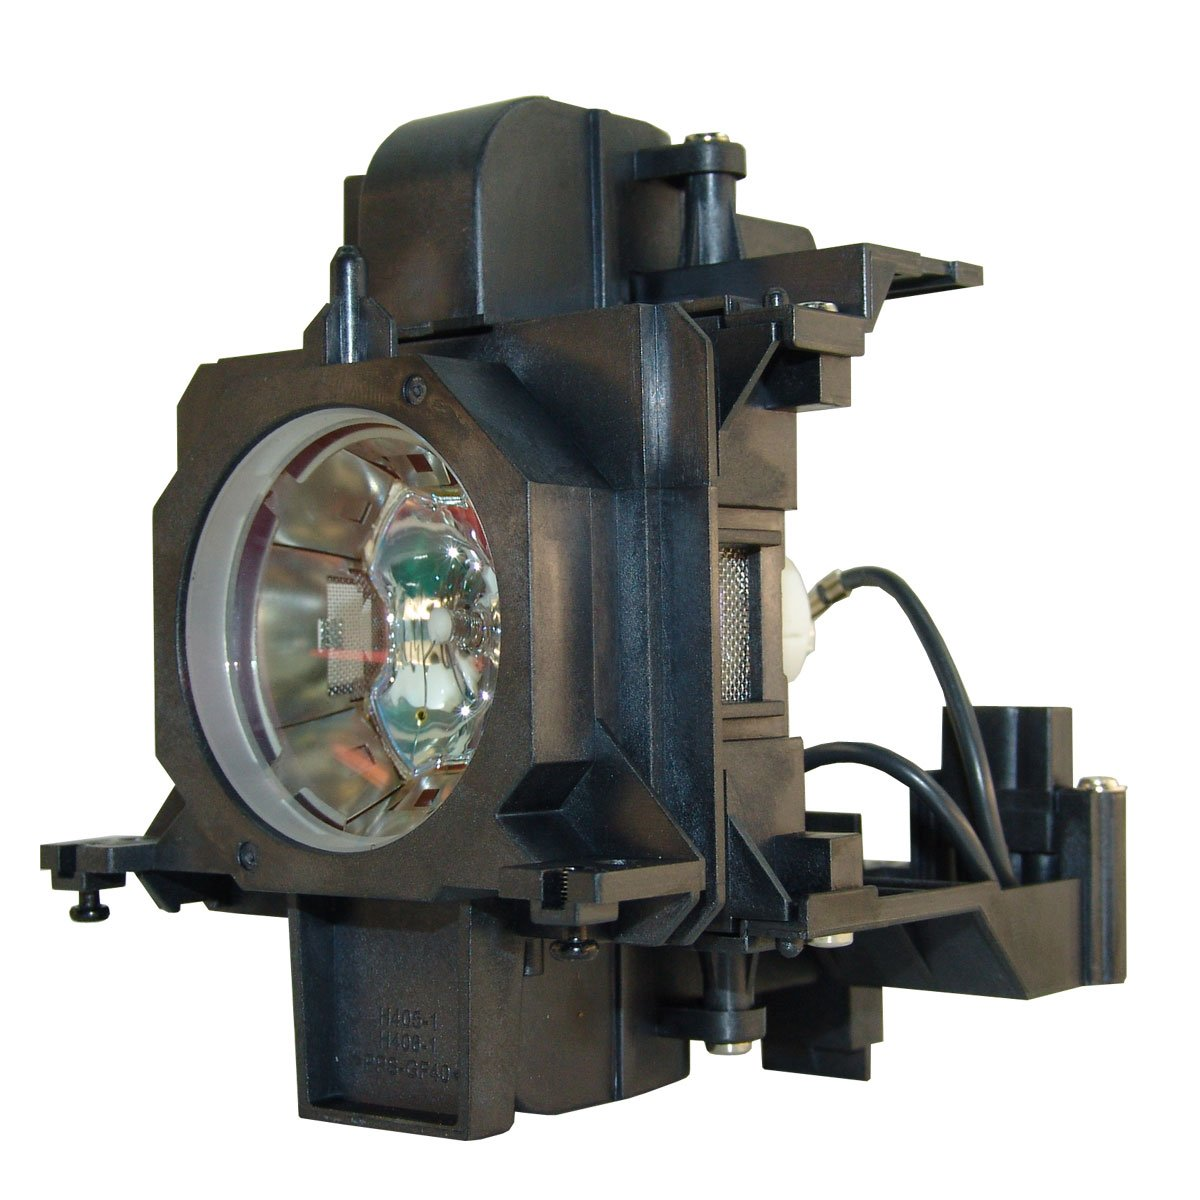 SpArc OEMプロジェクター交換用ランプ 囲い/電球付き Christie LW555用 Economy B07M754VPP Lamp with Housing Economy